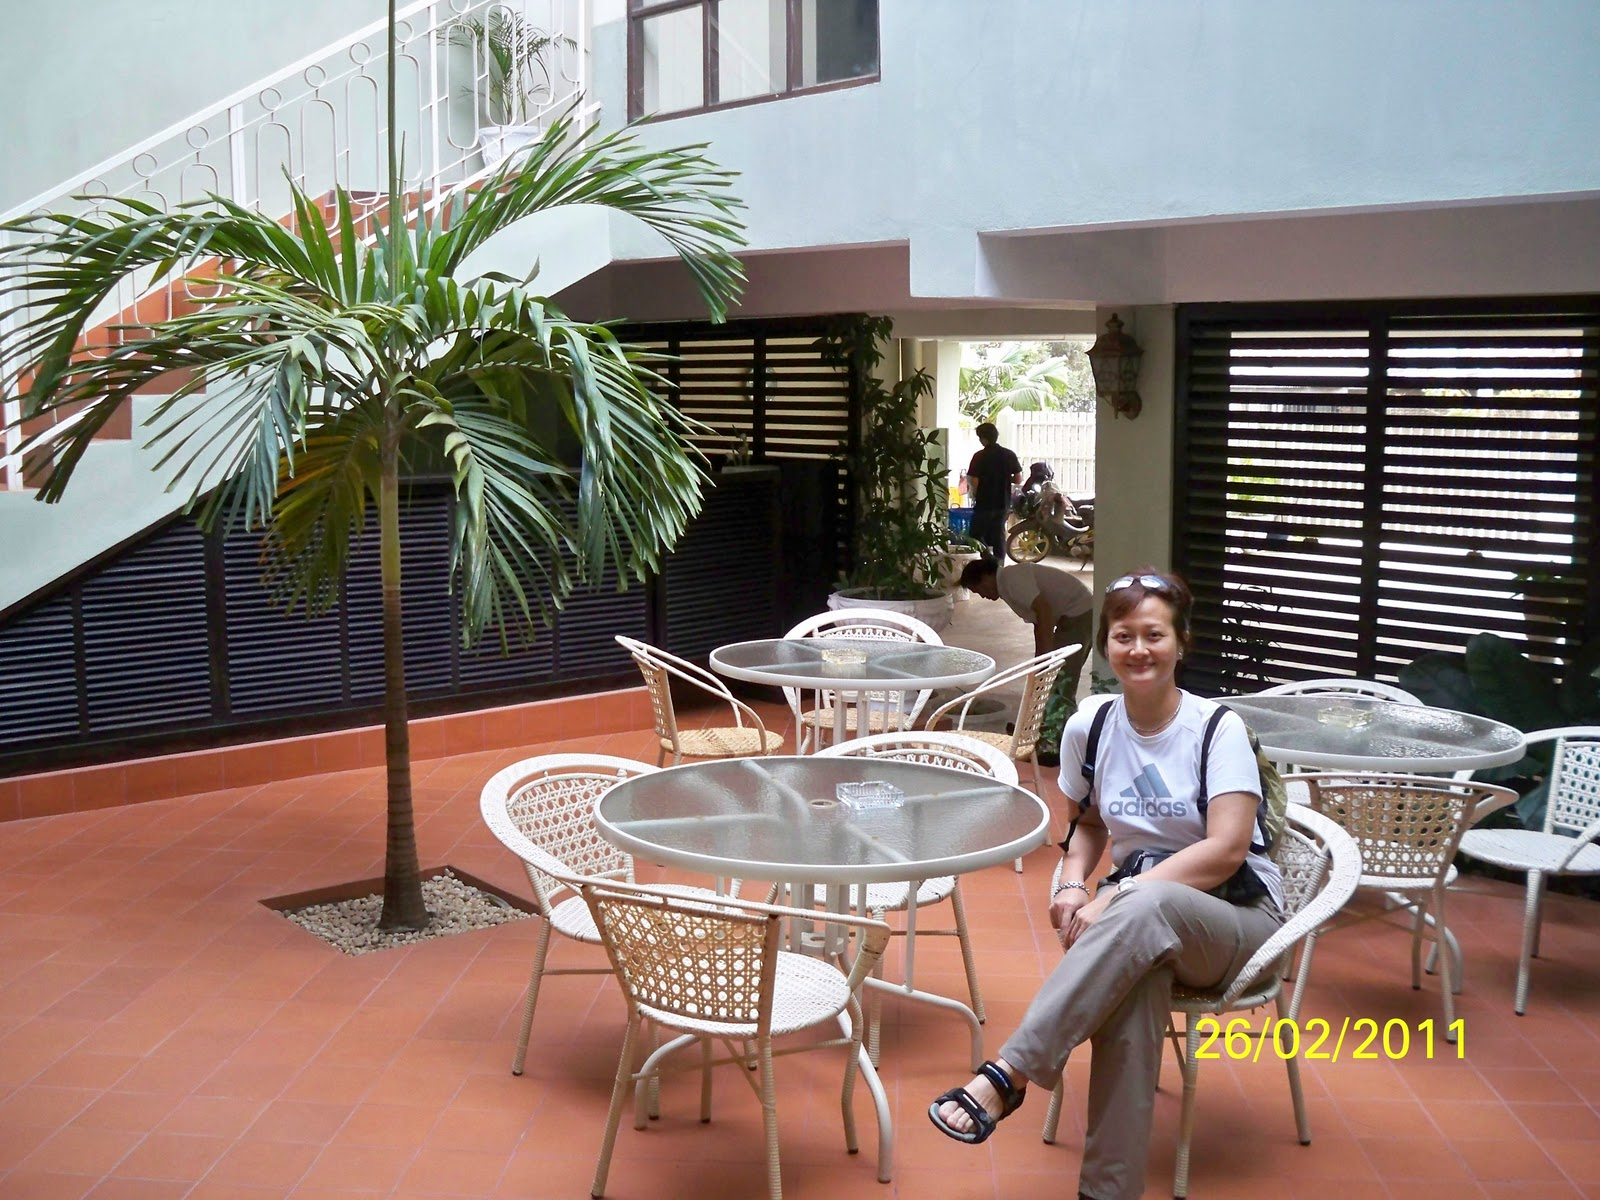 khamvongsa hotel Accomodation at Hotel Khamvongsa, Khun Bulom Road, Ban Vat Chan, Vientiane.  Tel + 85621 218415 or +85621 223257 Email : hotel.khamvongsa@gmail.com ...